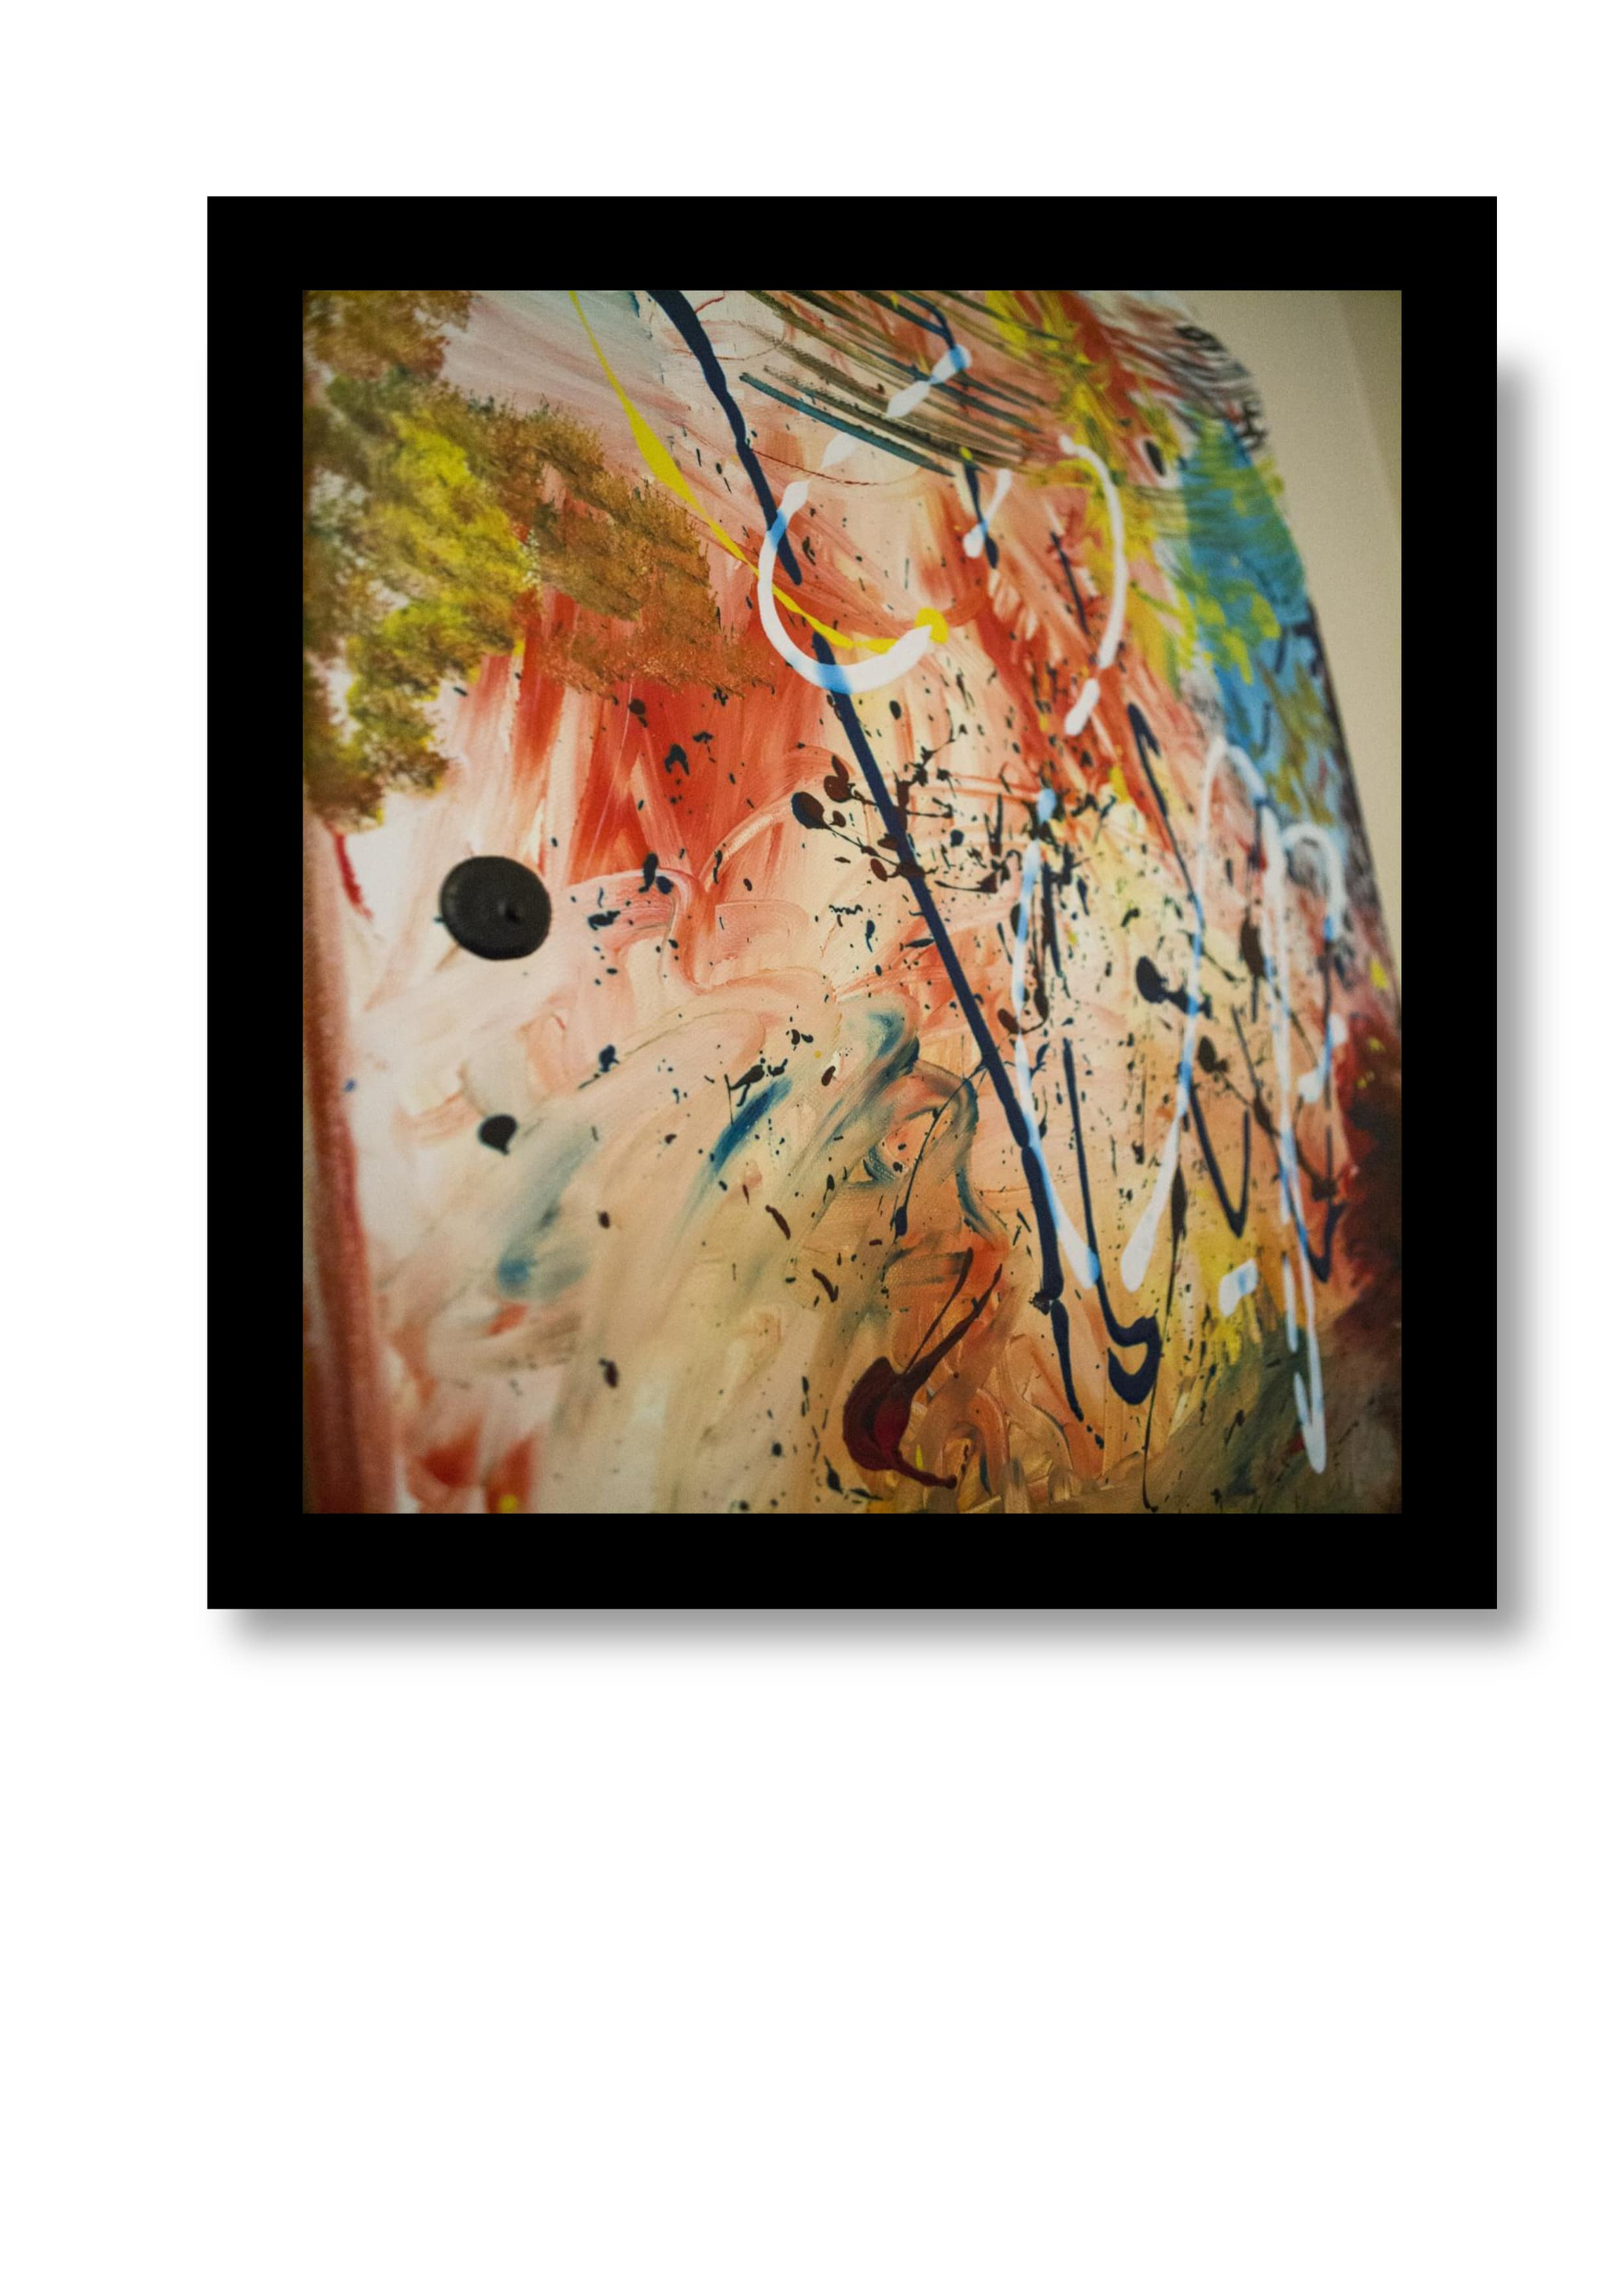 art-portfolio-aglae-corrected-3-min.jpg